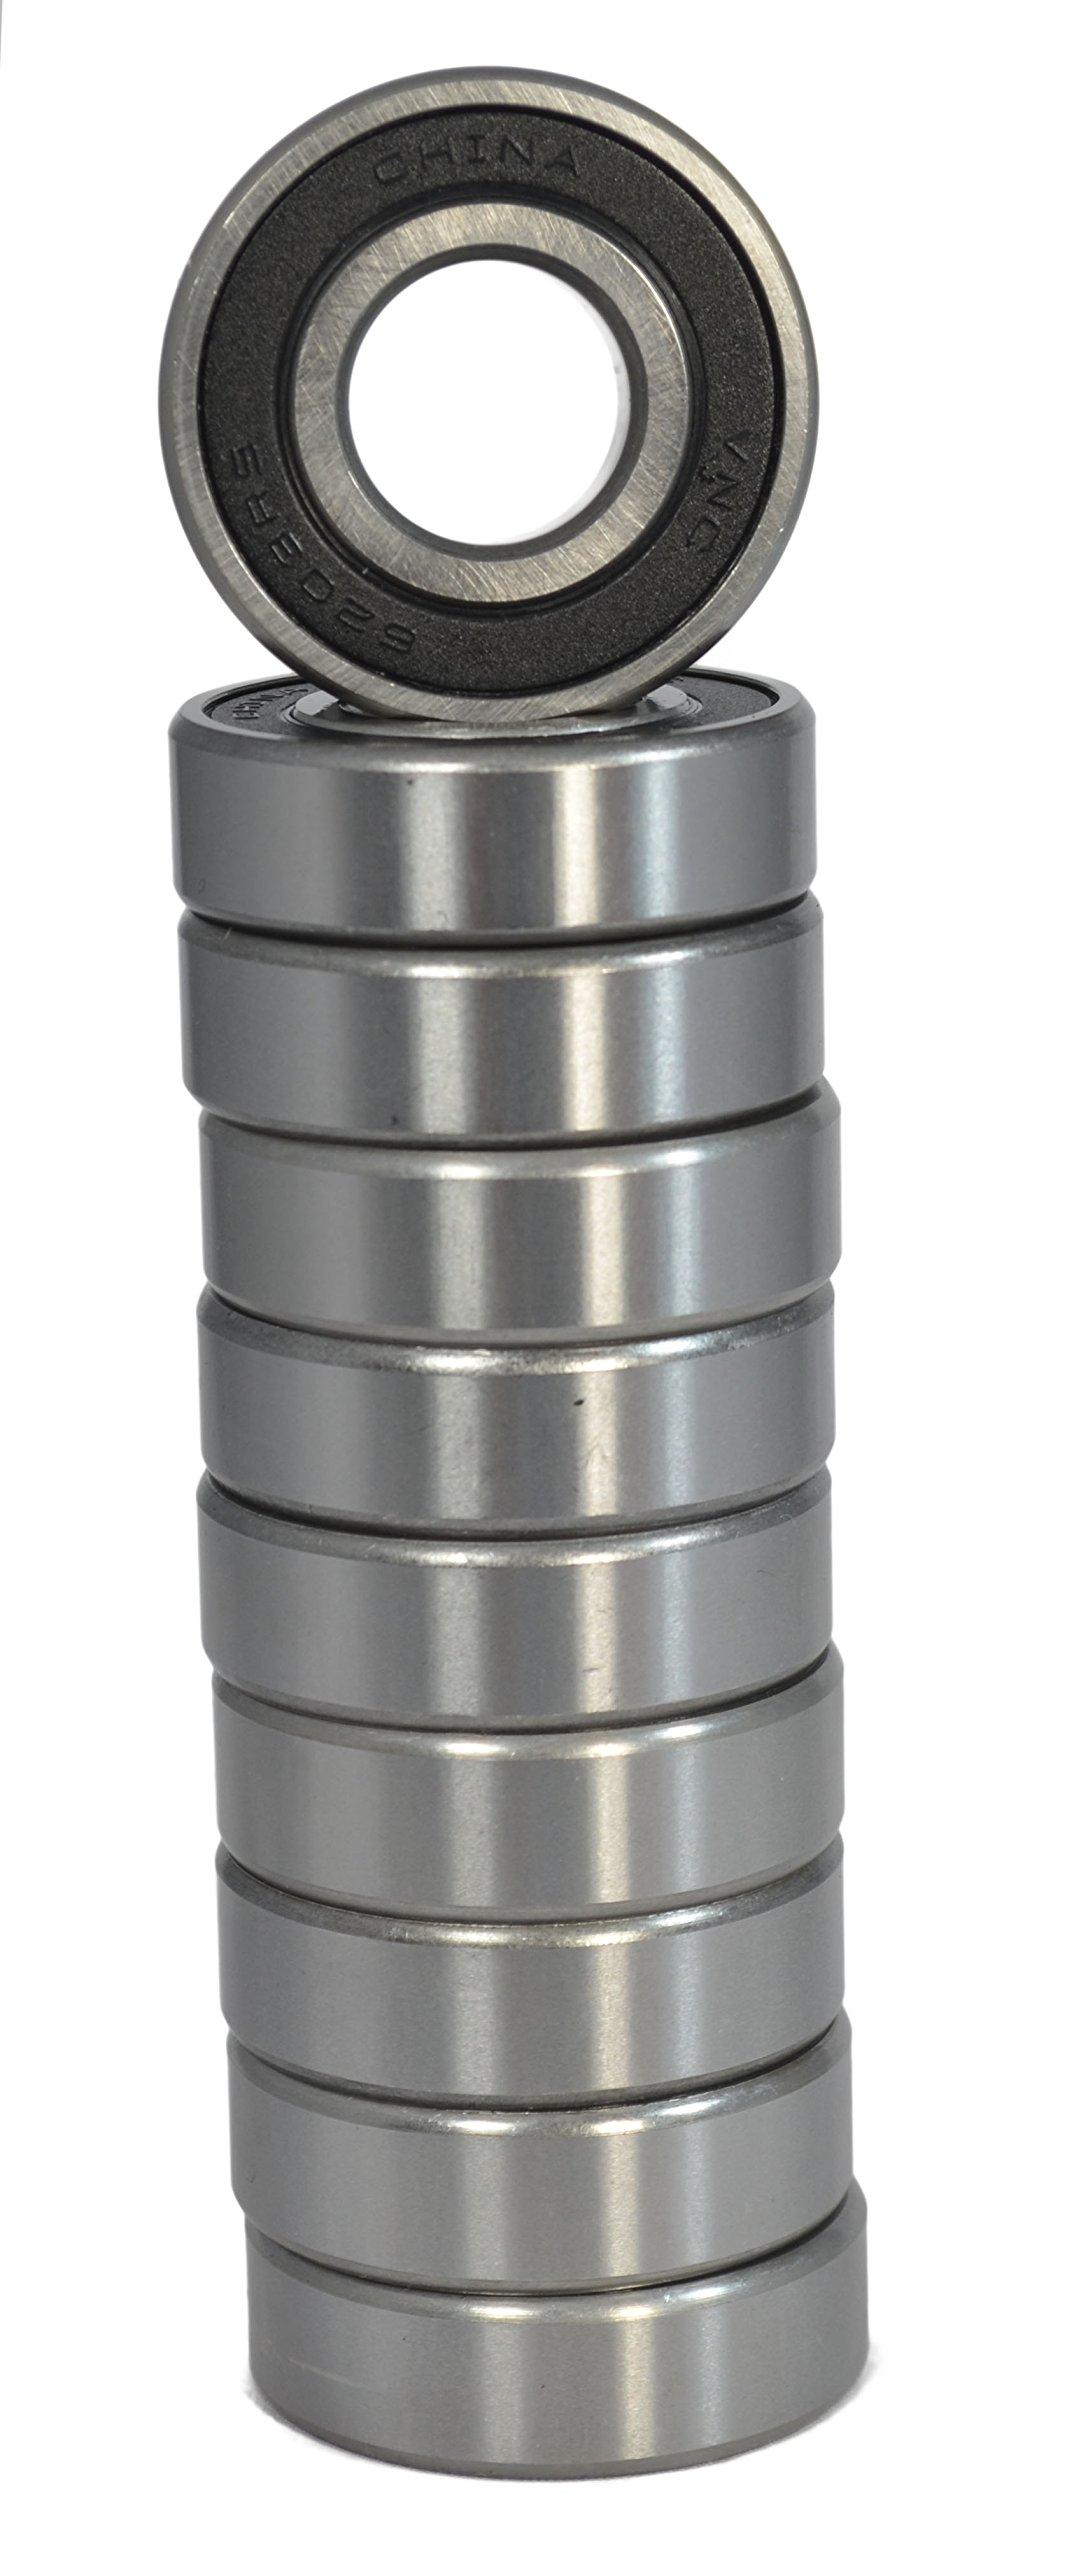 R4-2RS (1/4''x5/8''x0.196'') C3 Premium Sealed Radial Ball Bearing 10 pack